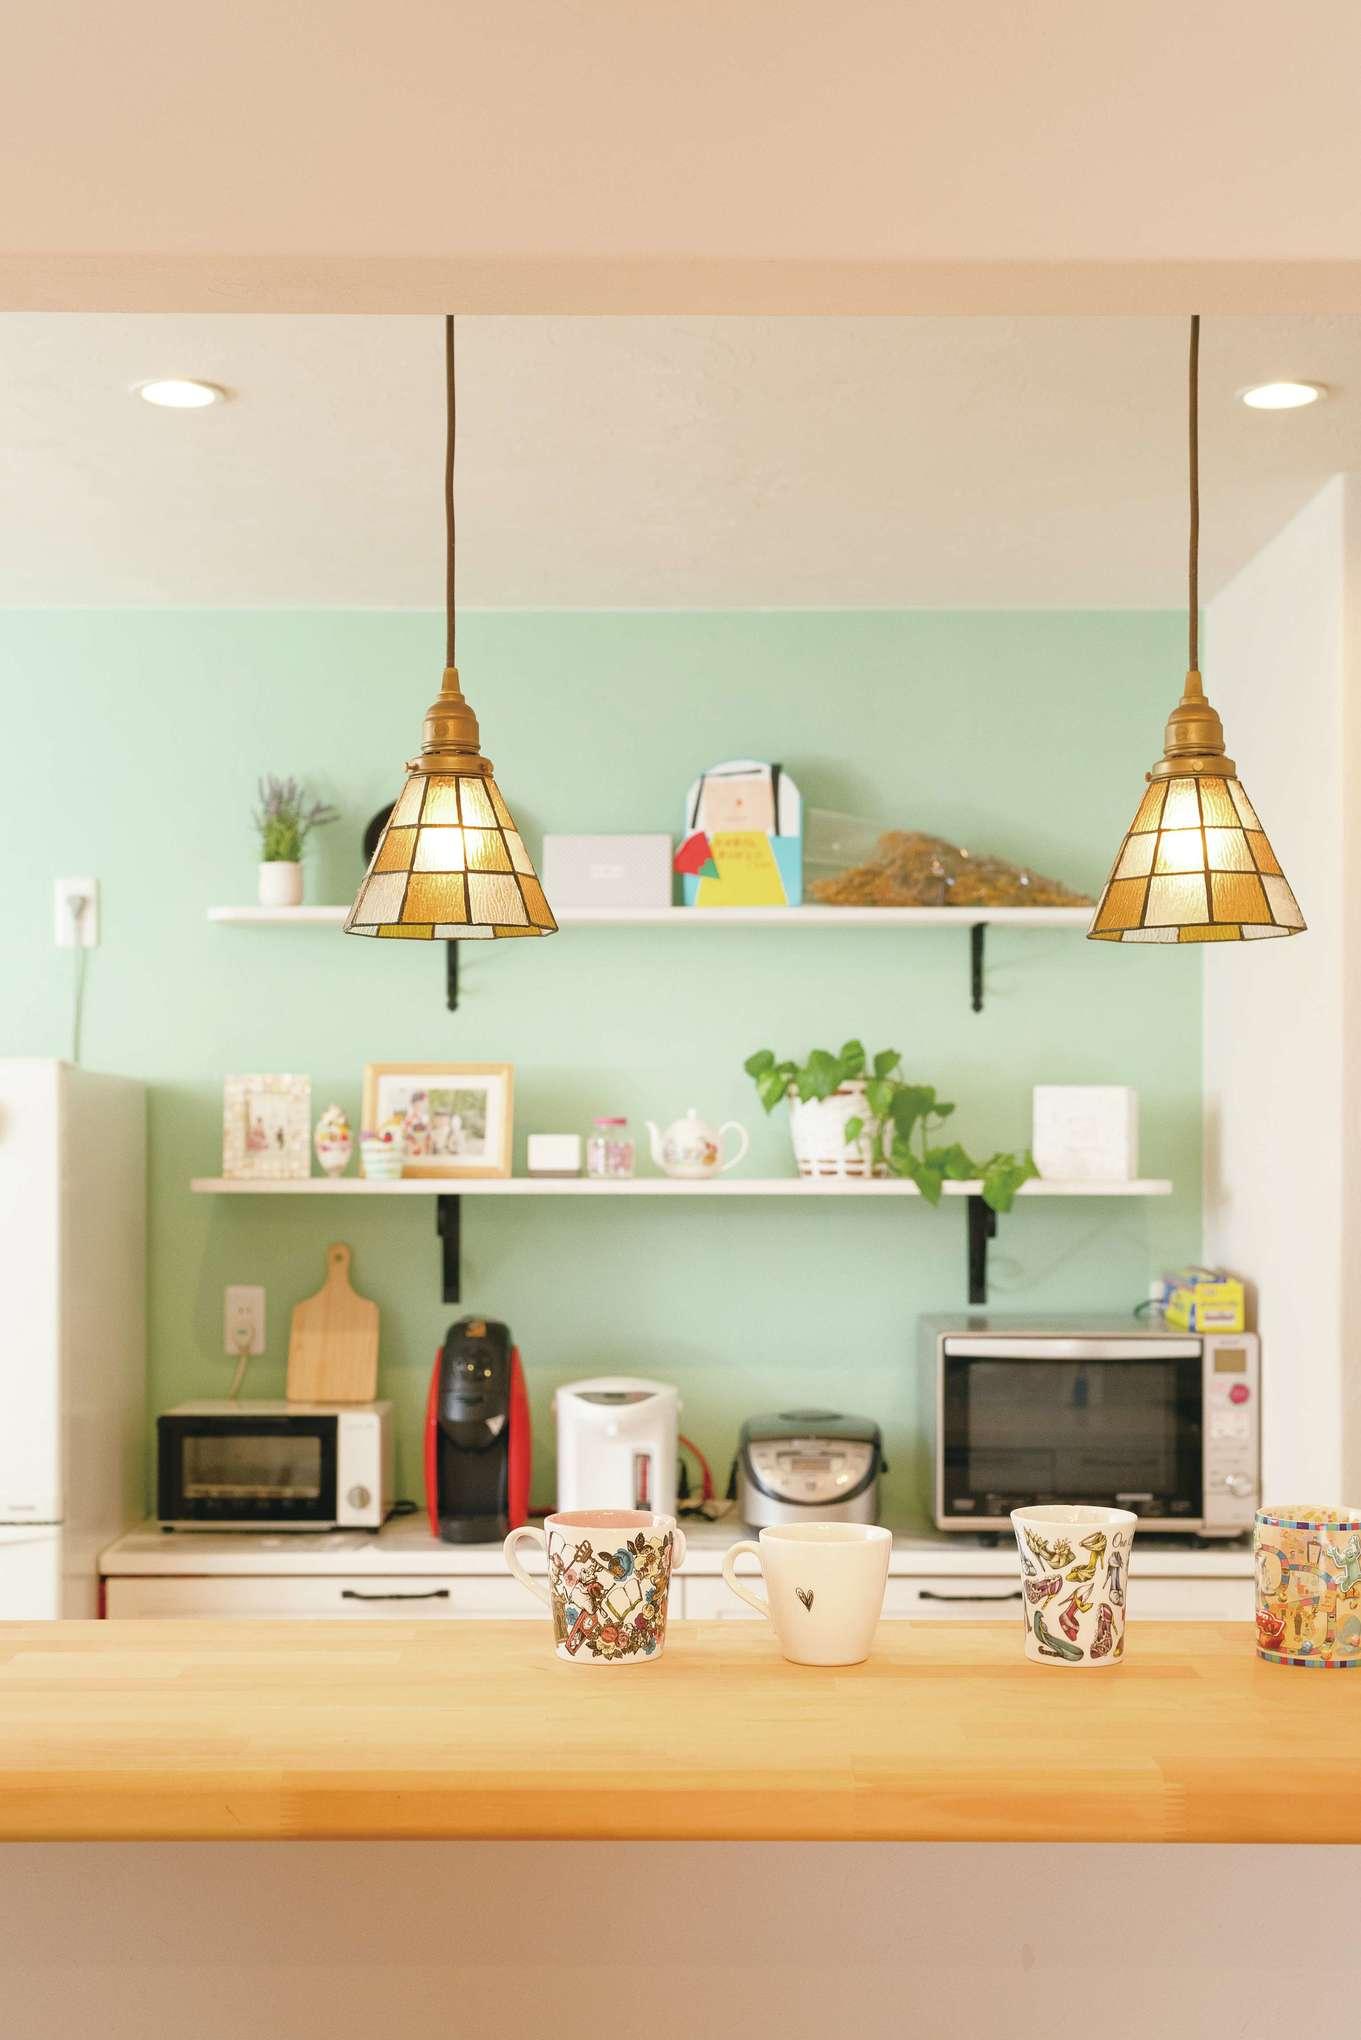 Dサポート【趣味、自然素材、ガレージ】ミントグリーンの色壁がきいたキッチン